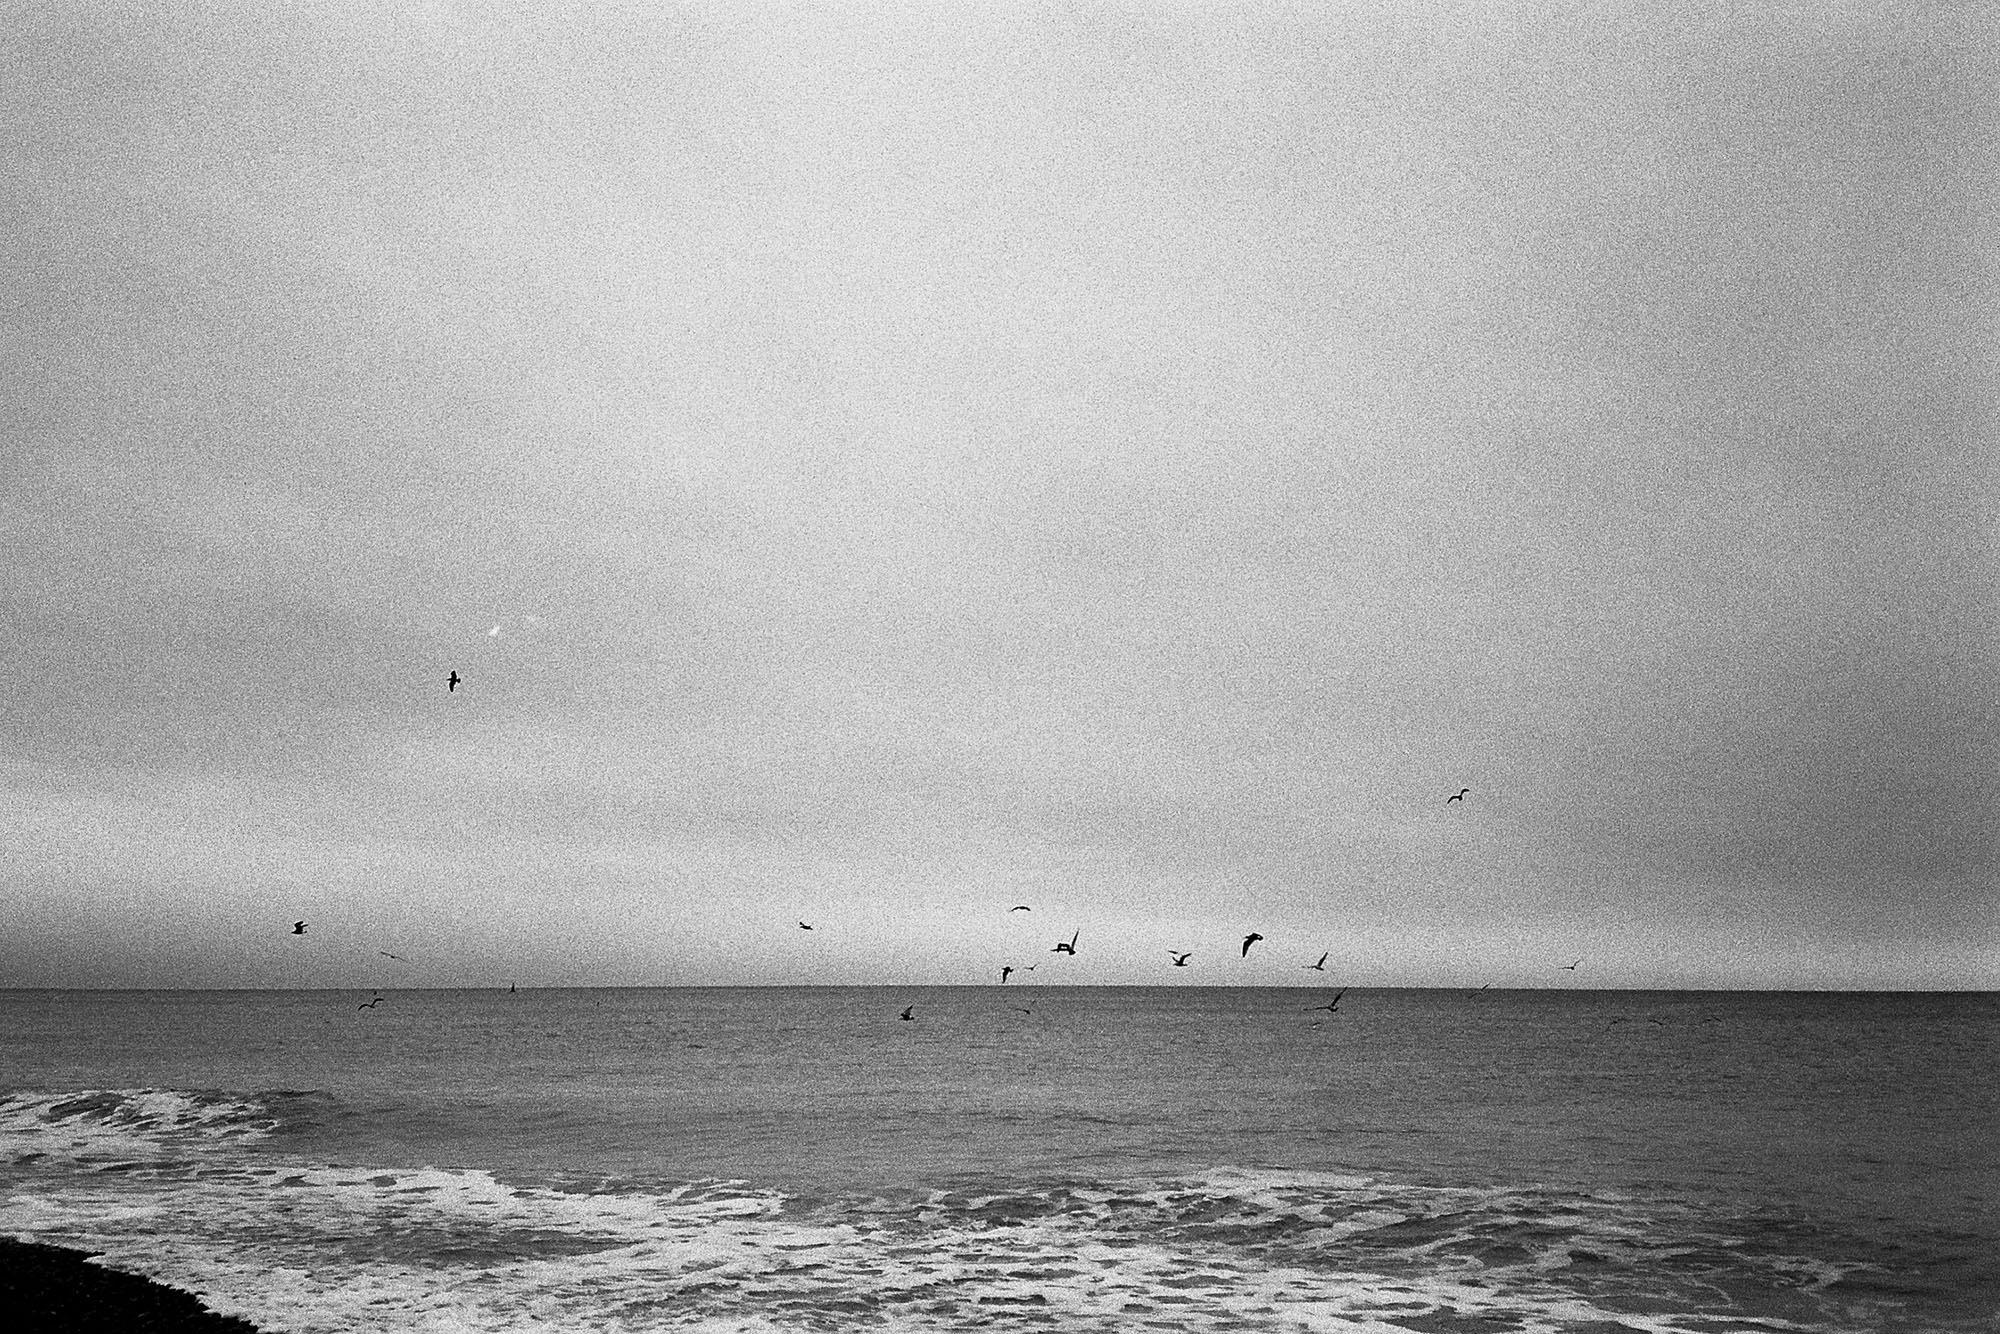 scenic-view-brighton-beach-birds-film-photography